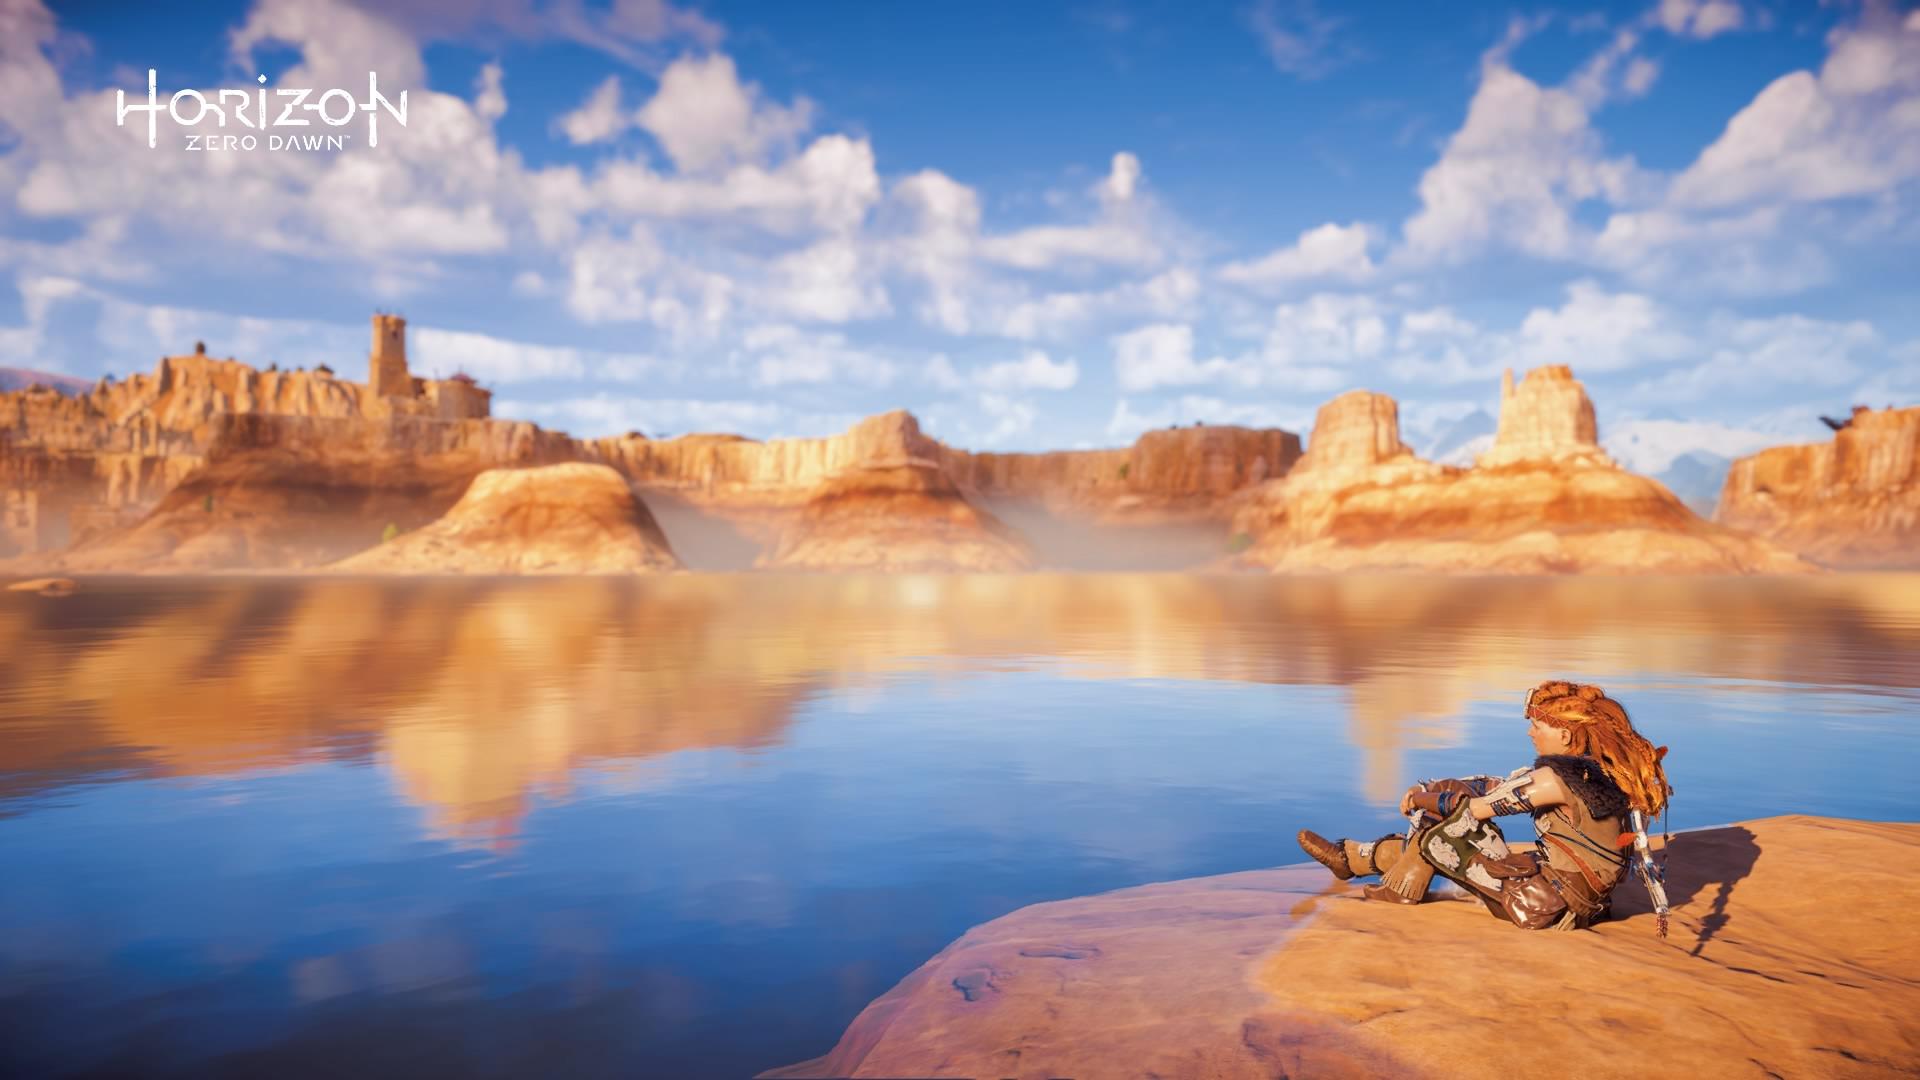 Horizon Zero Dawn HD Wallpaper | Background Image ...